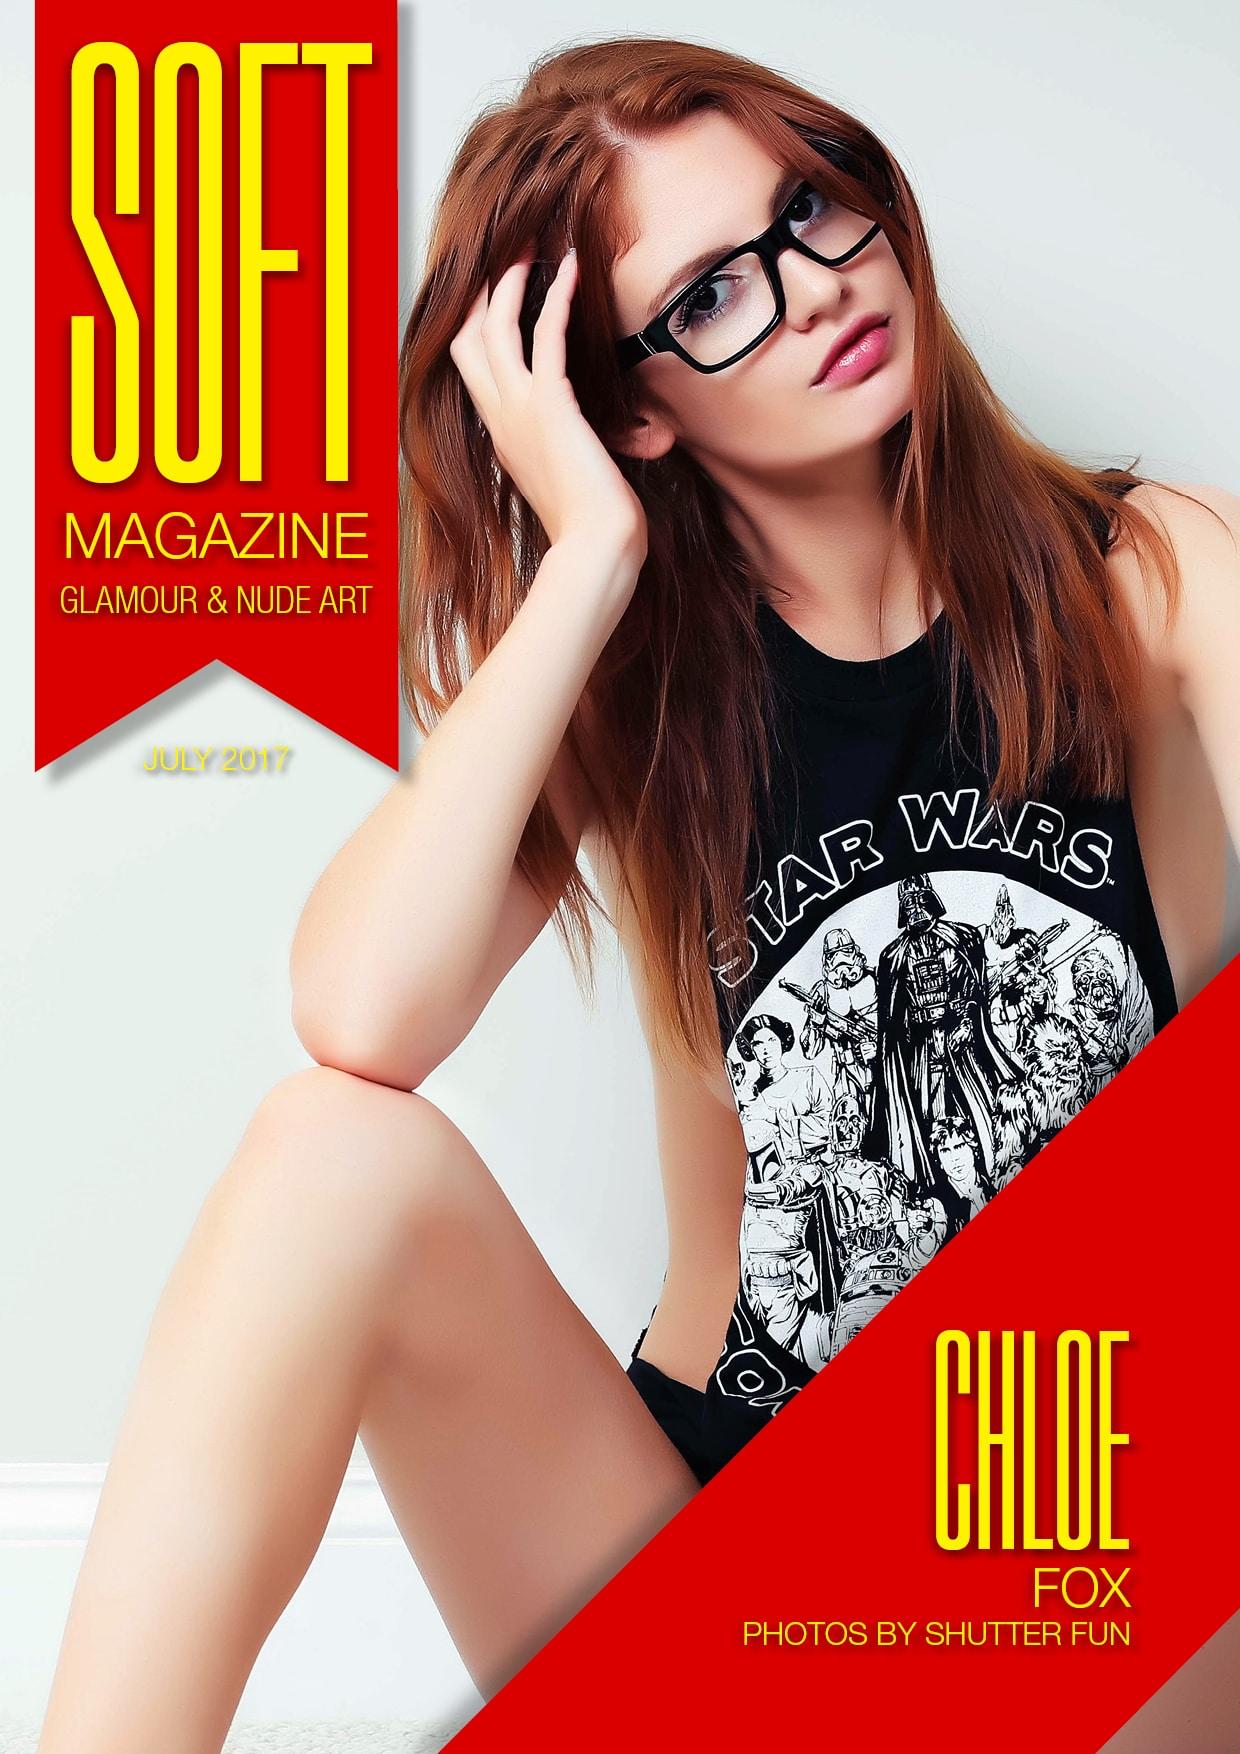 Soft Magazine - July 2017 - Chloe Fox